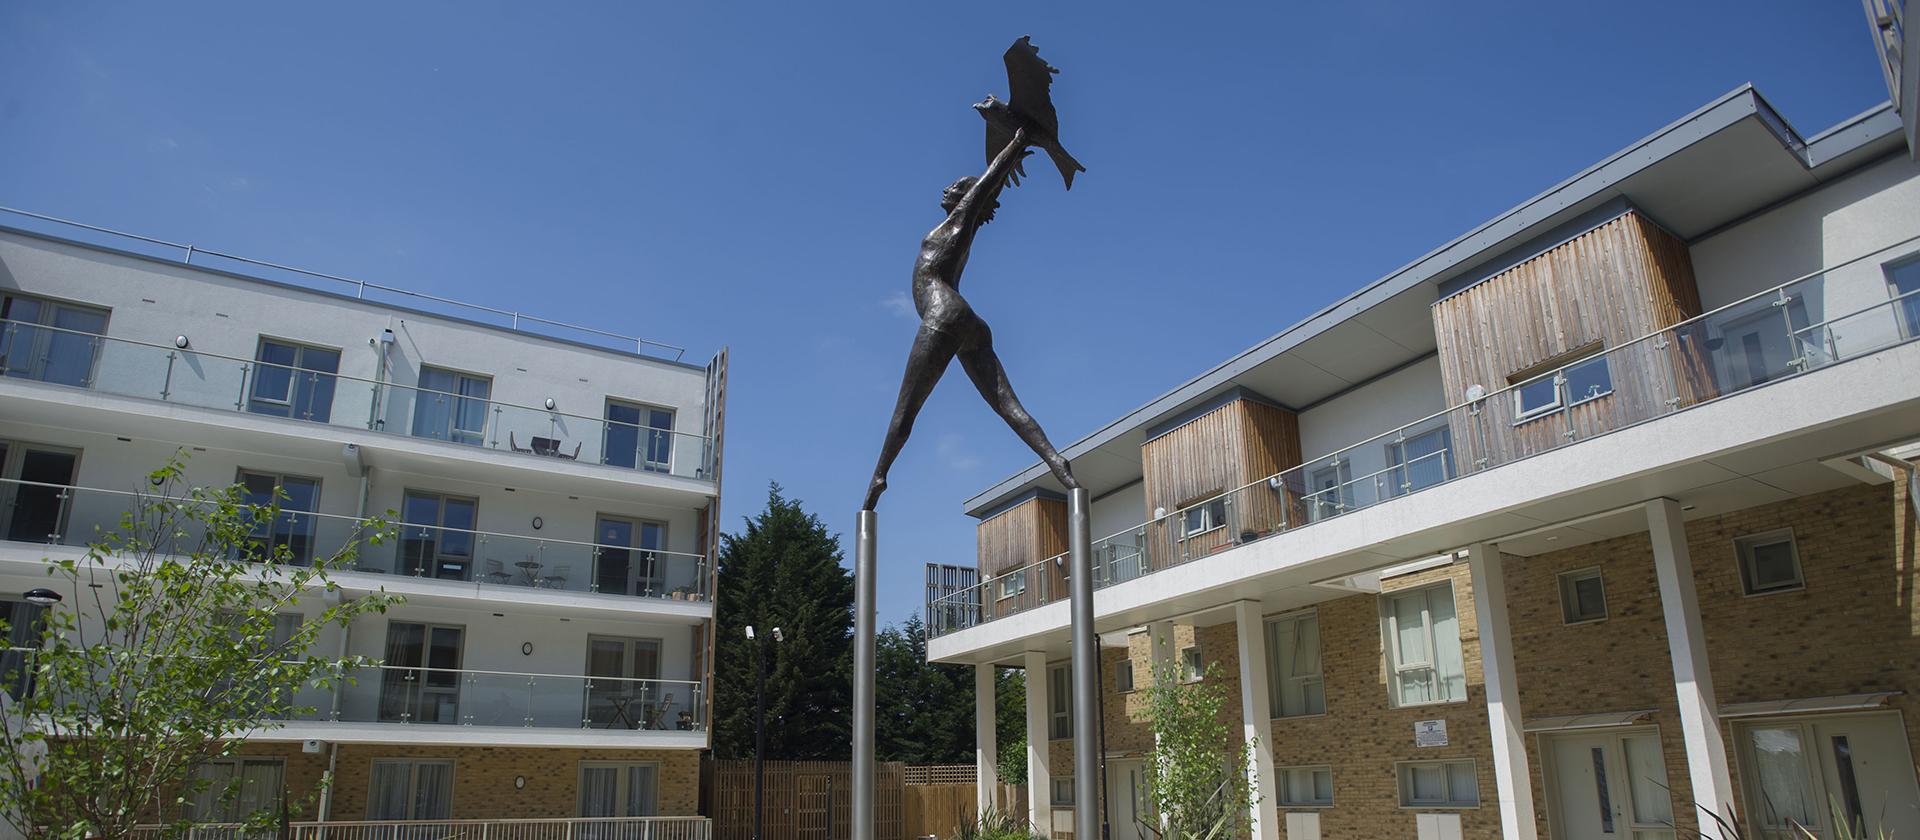 (c) Onehousing.co.uk